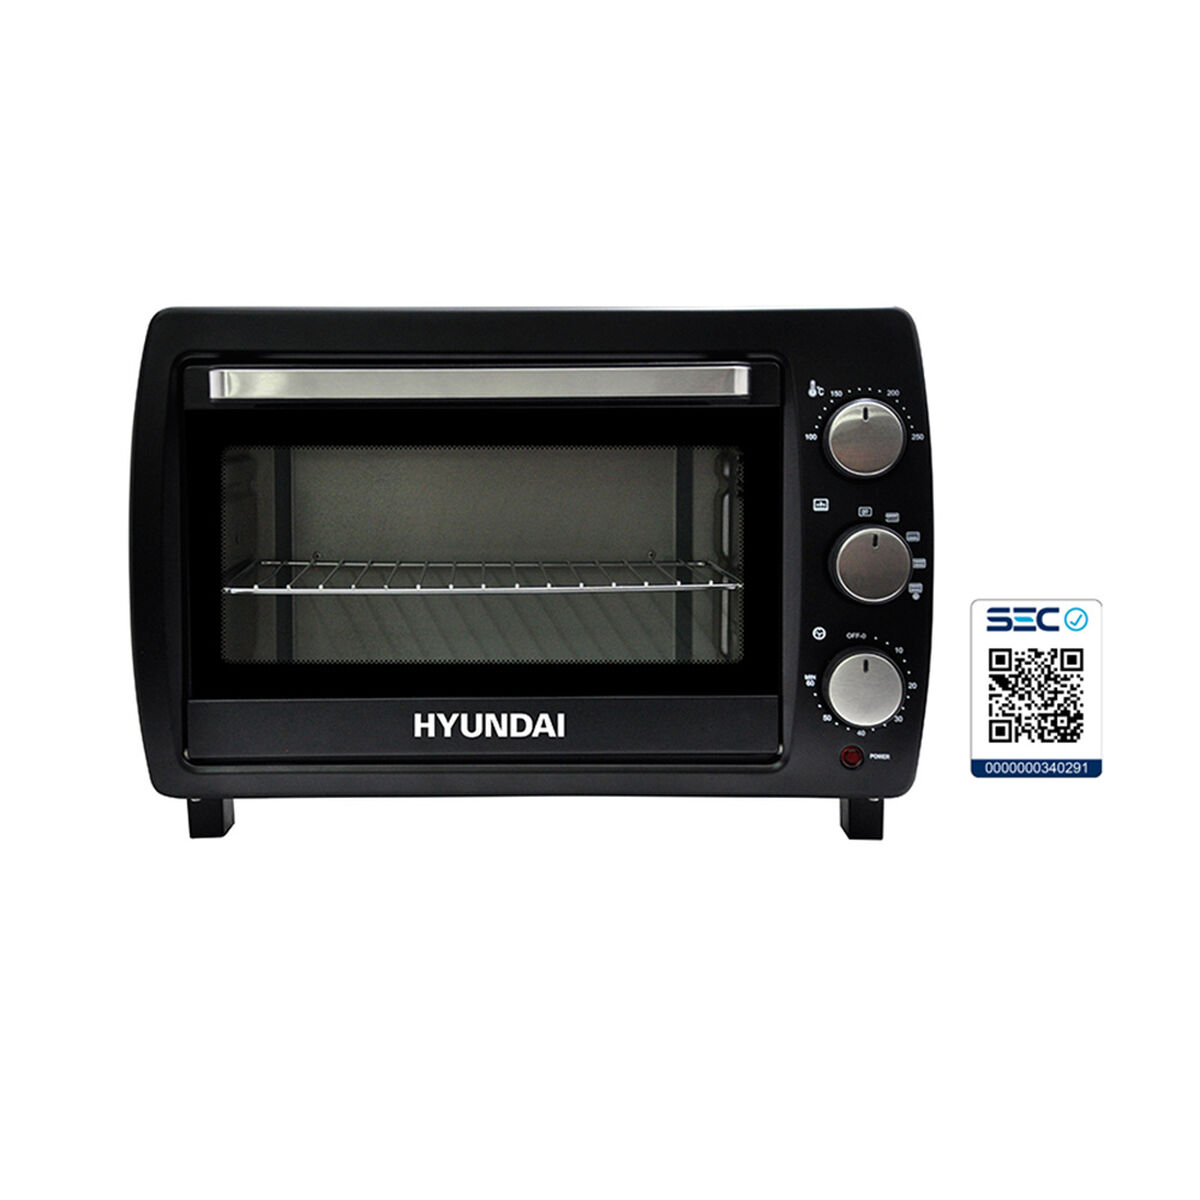 Horno Eléctrico Hyundai HY28N 28 lt.